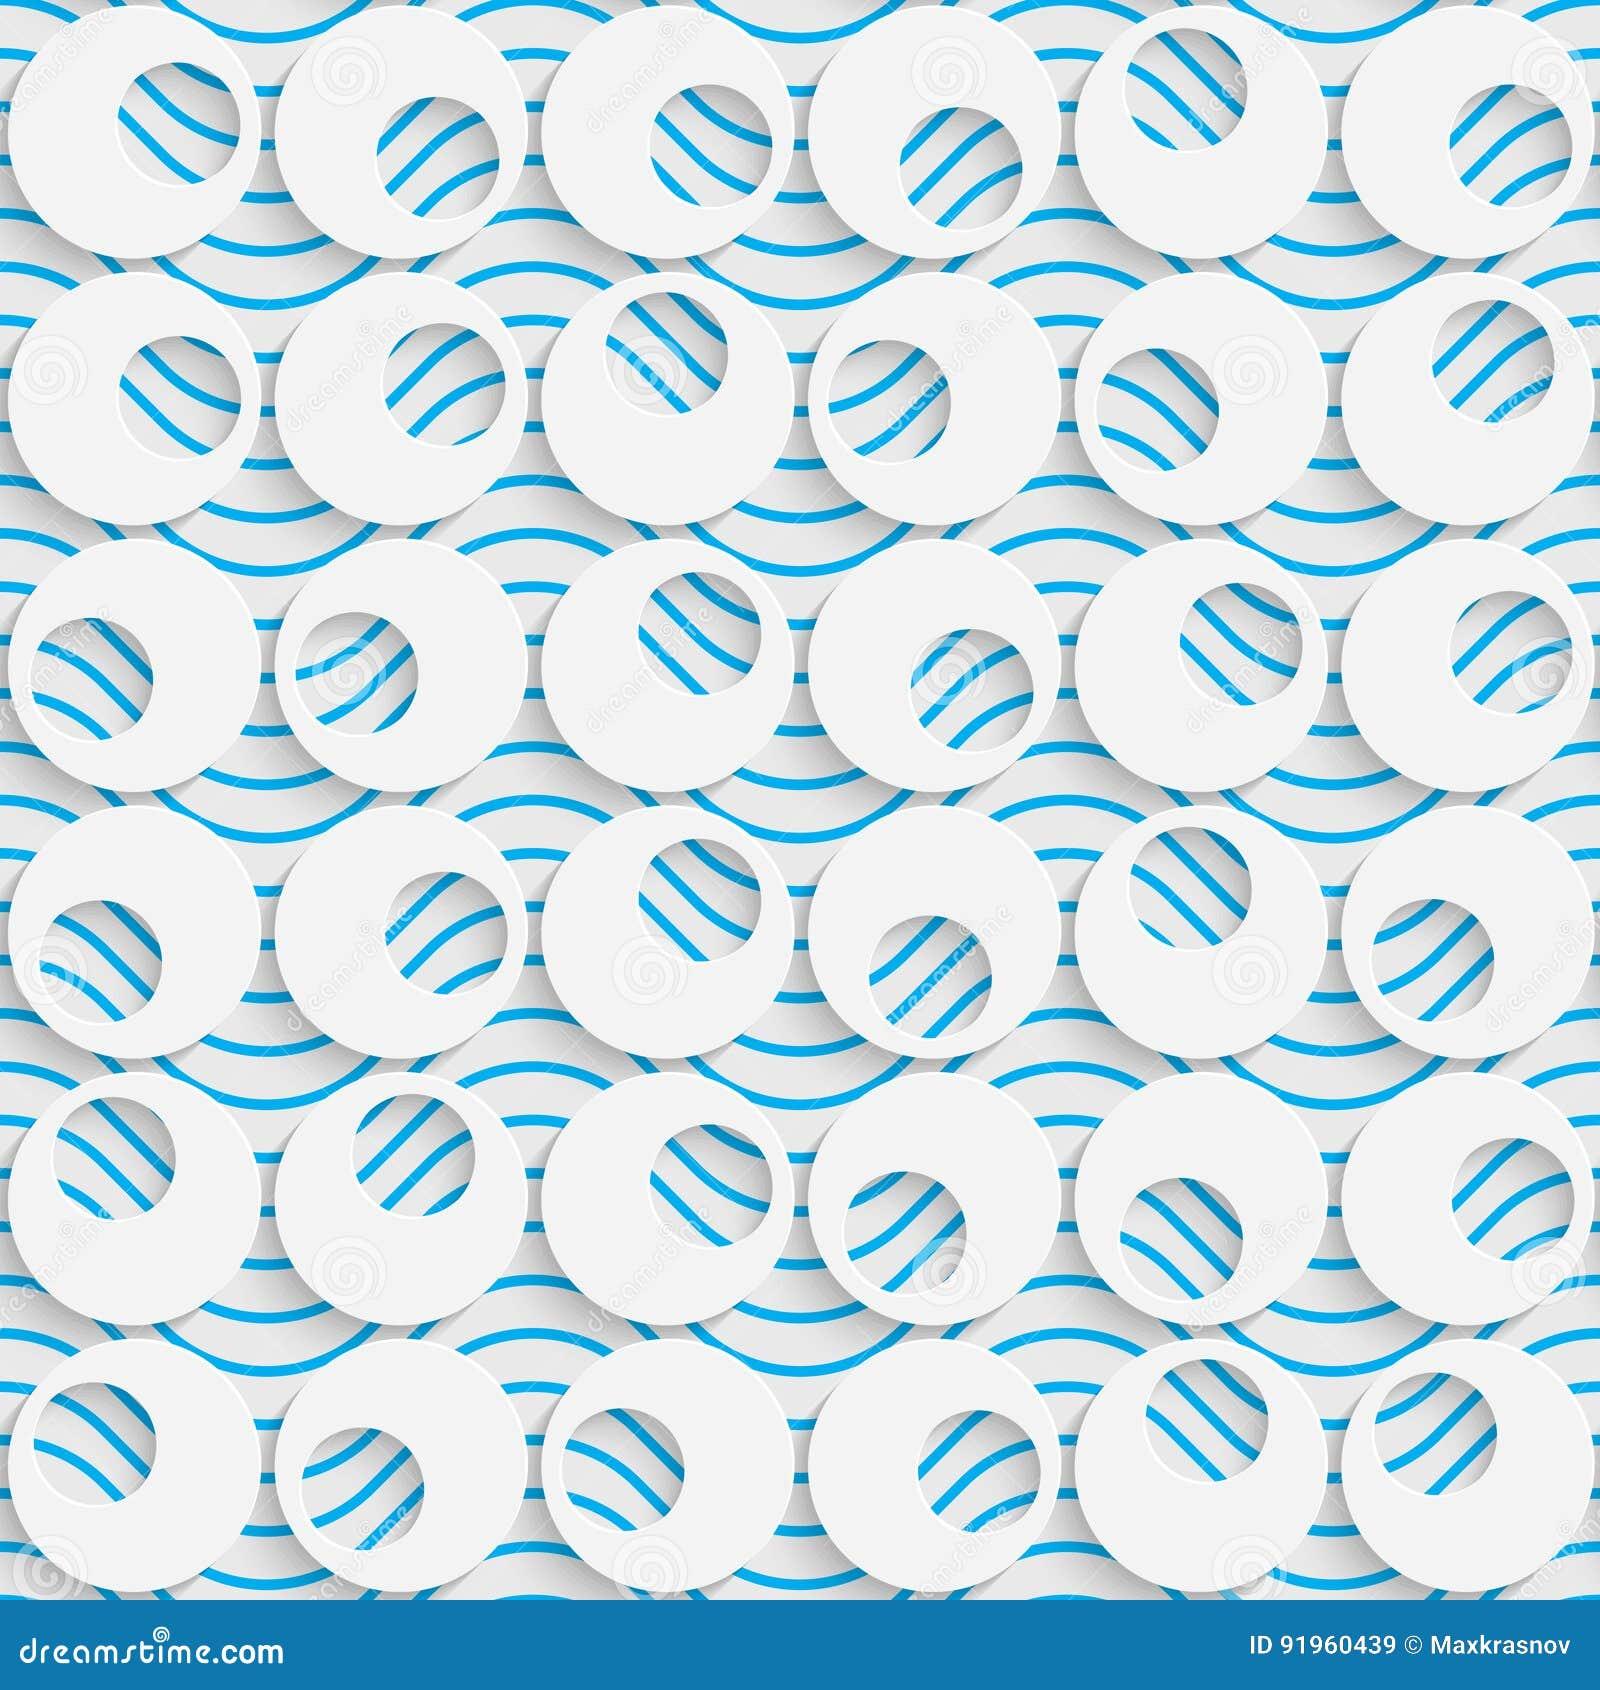 Seamless Circle Design. Futuristic Tile Pattern Stock Vector ...